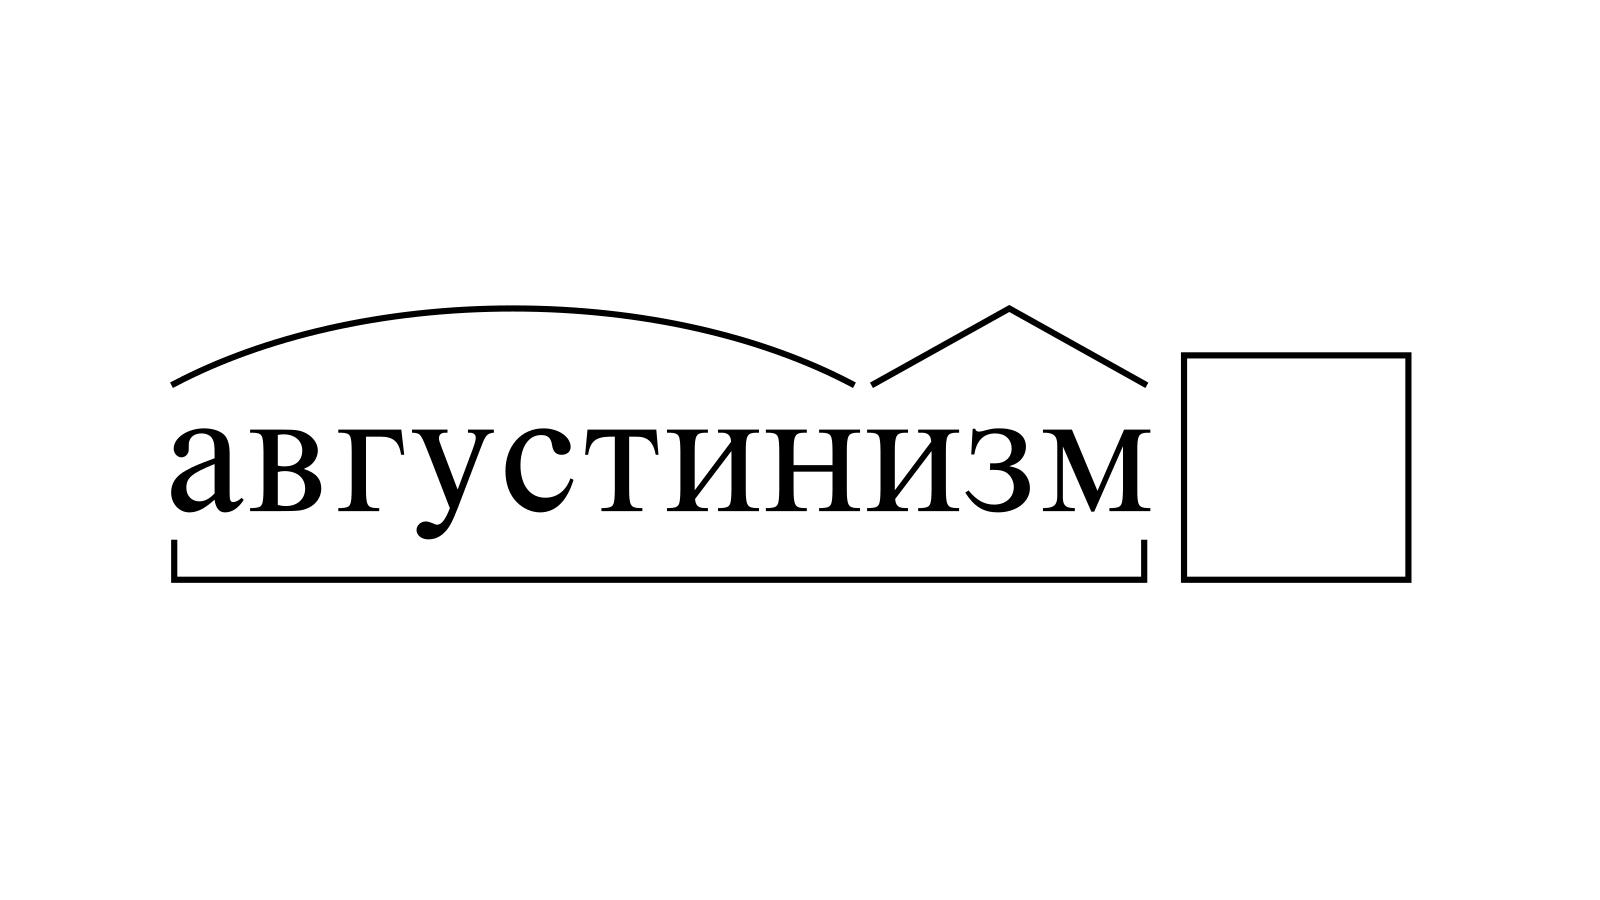 Разбор слова «августинизм» по составу